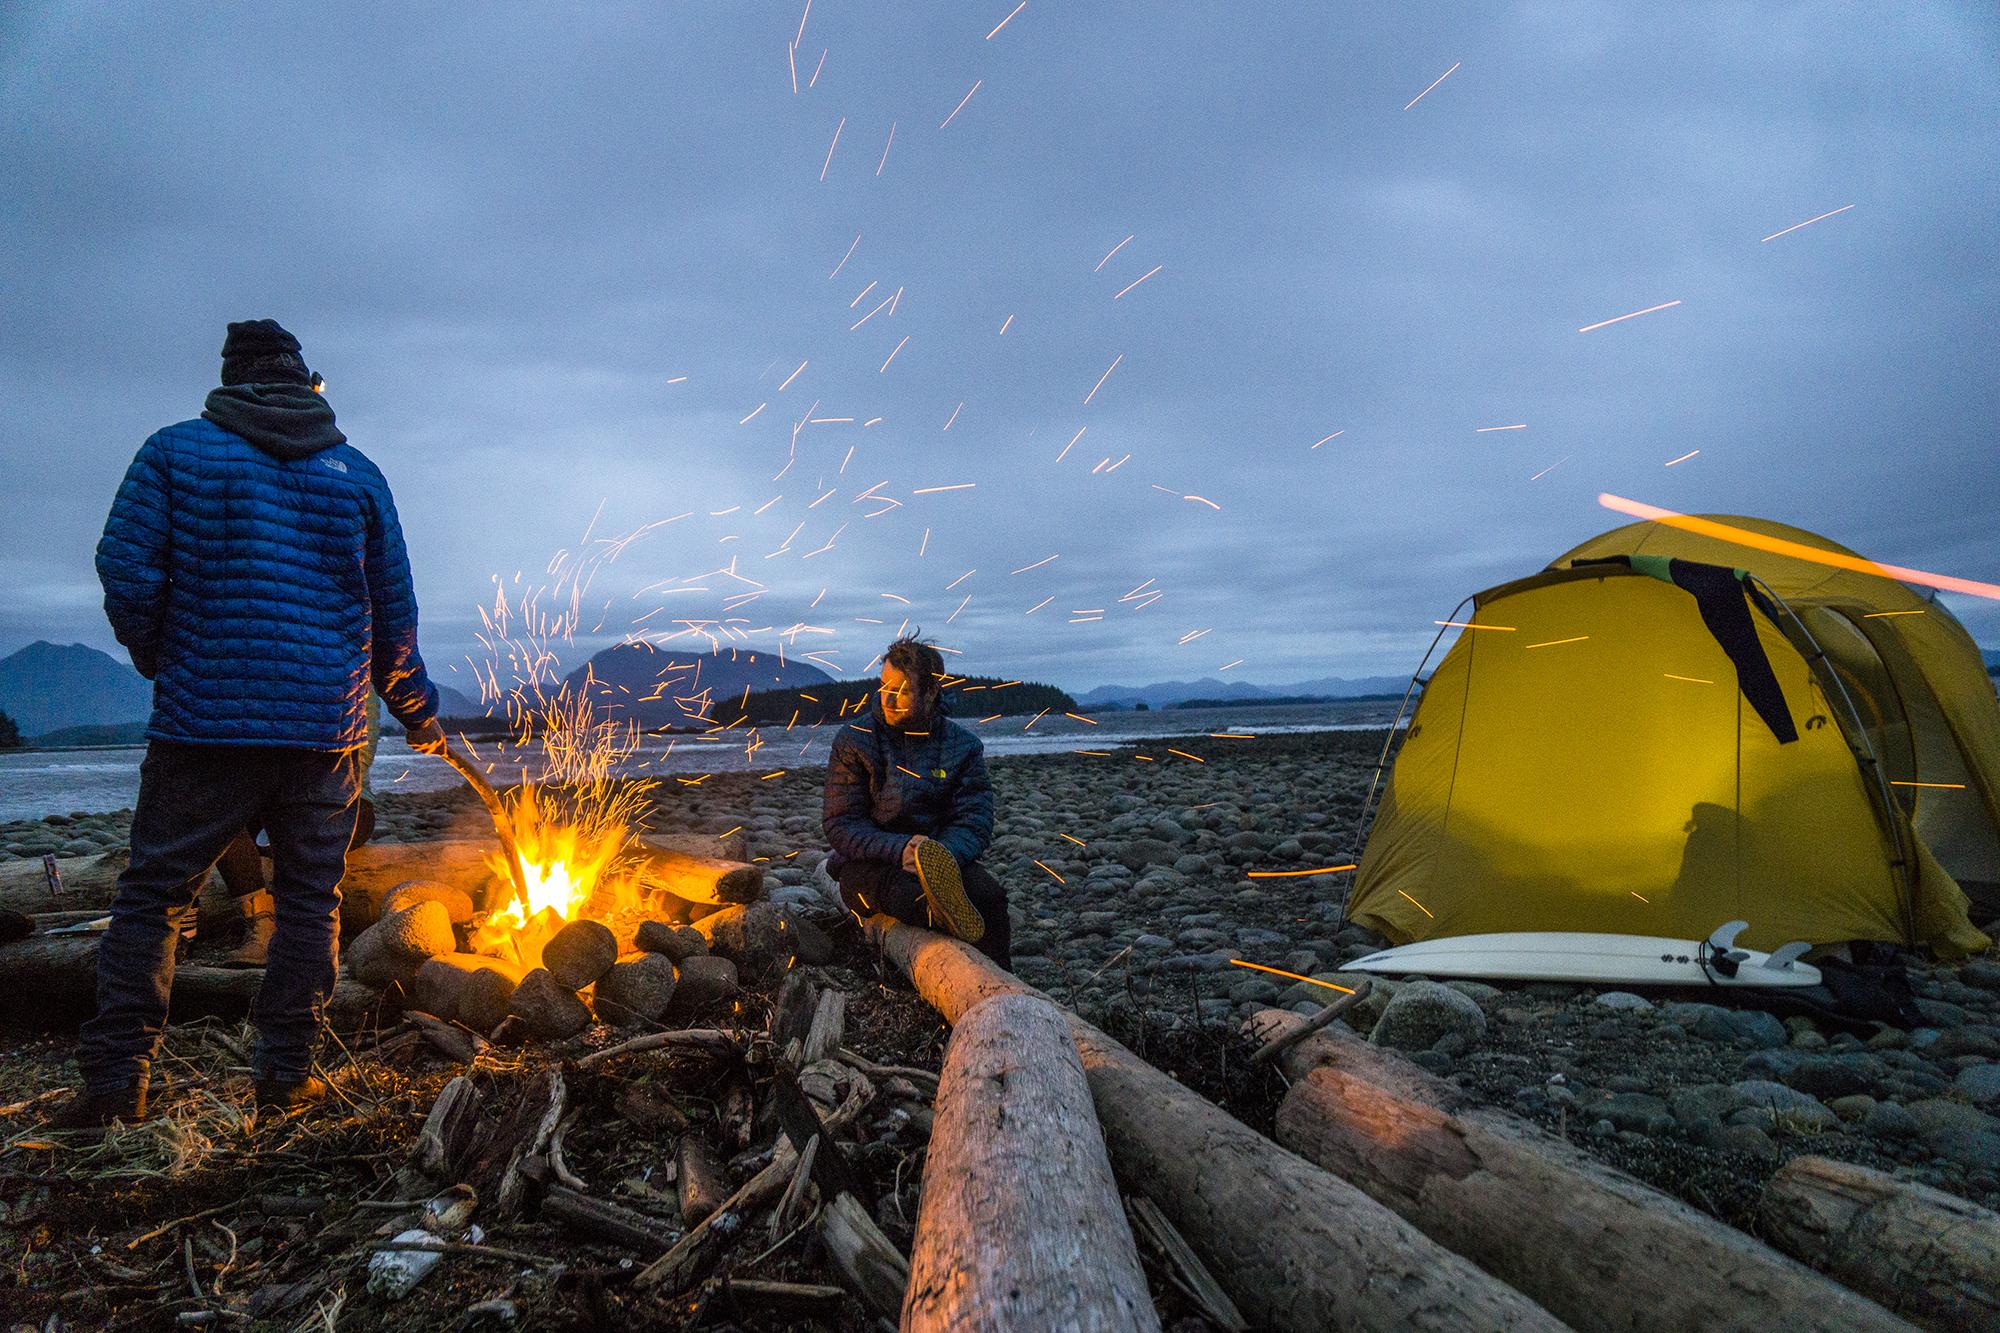 David Carrier Porcheron and Callum Pettit. Vancouver Island, British Columbia. Photography by Chris Burkard.